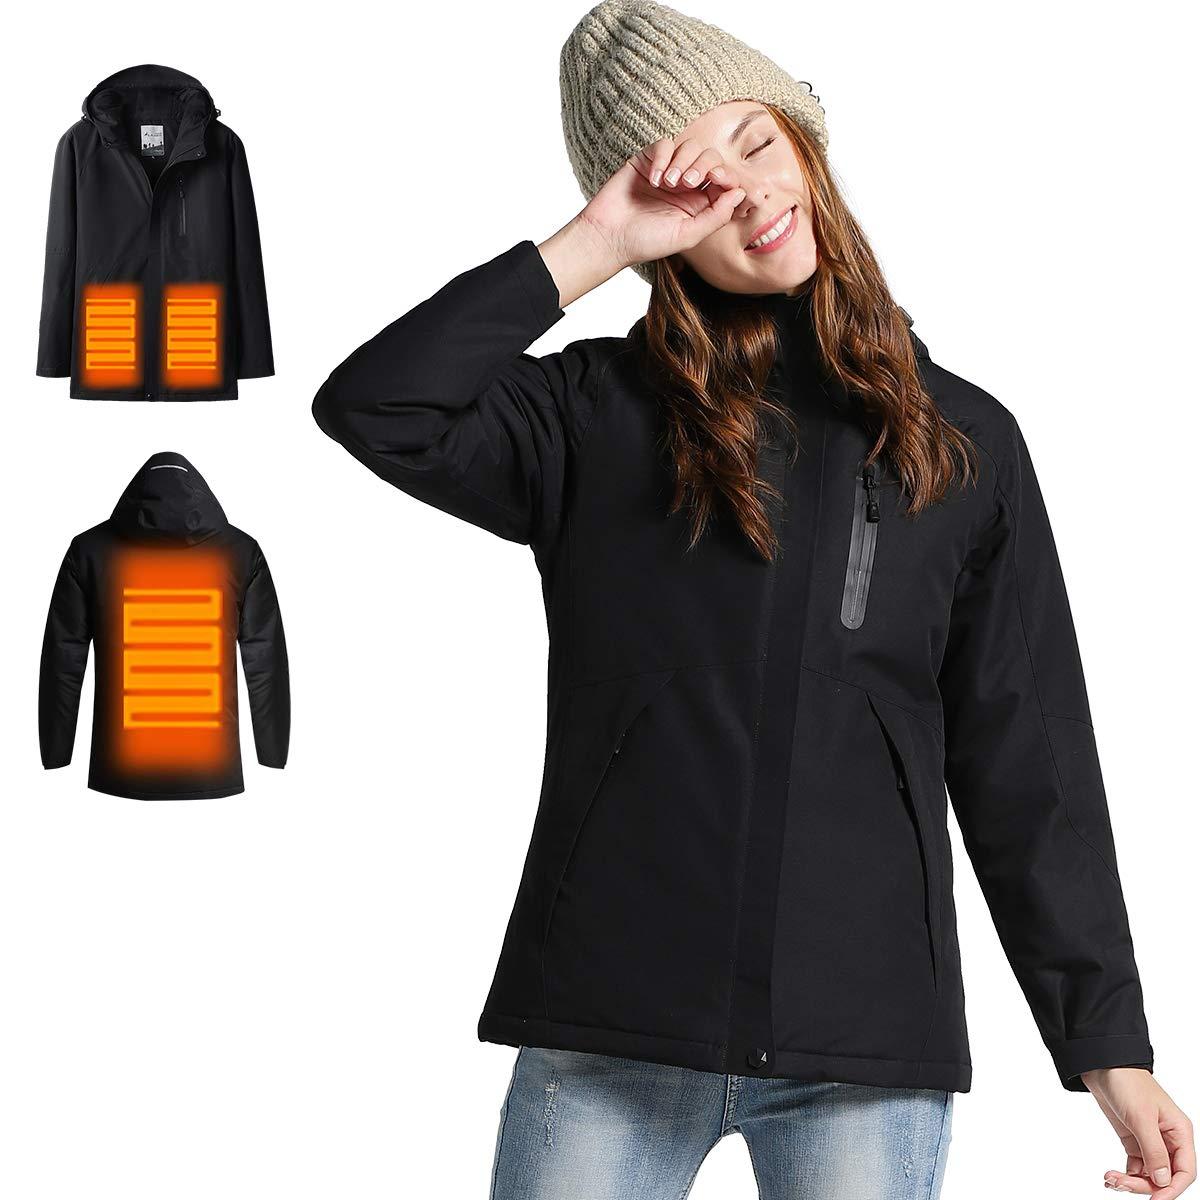 Venustas Women's Heated Jacket Winter Jacket with Non-Detachable Hood, Waterproof& Windproof (ADD Battery Pack to CART) Black by Venustas